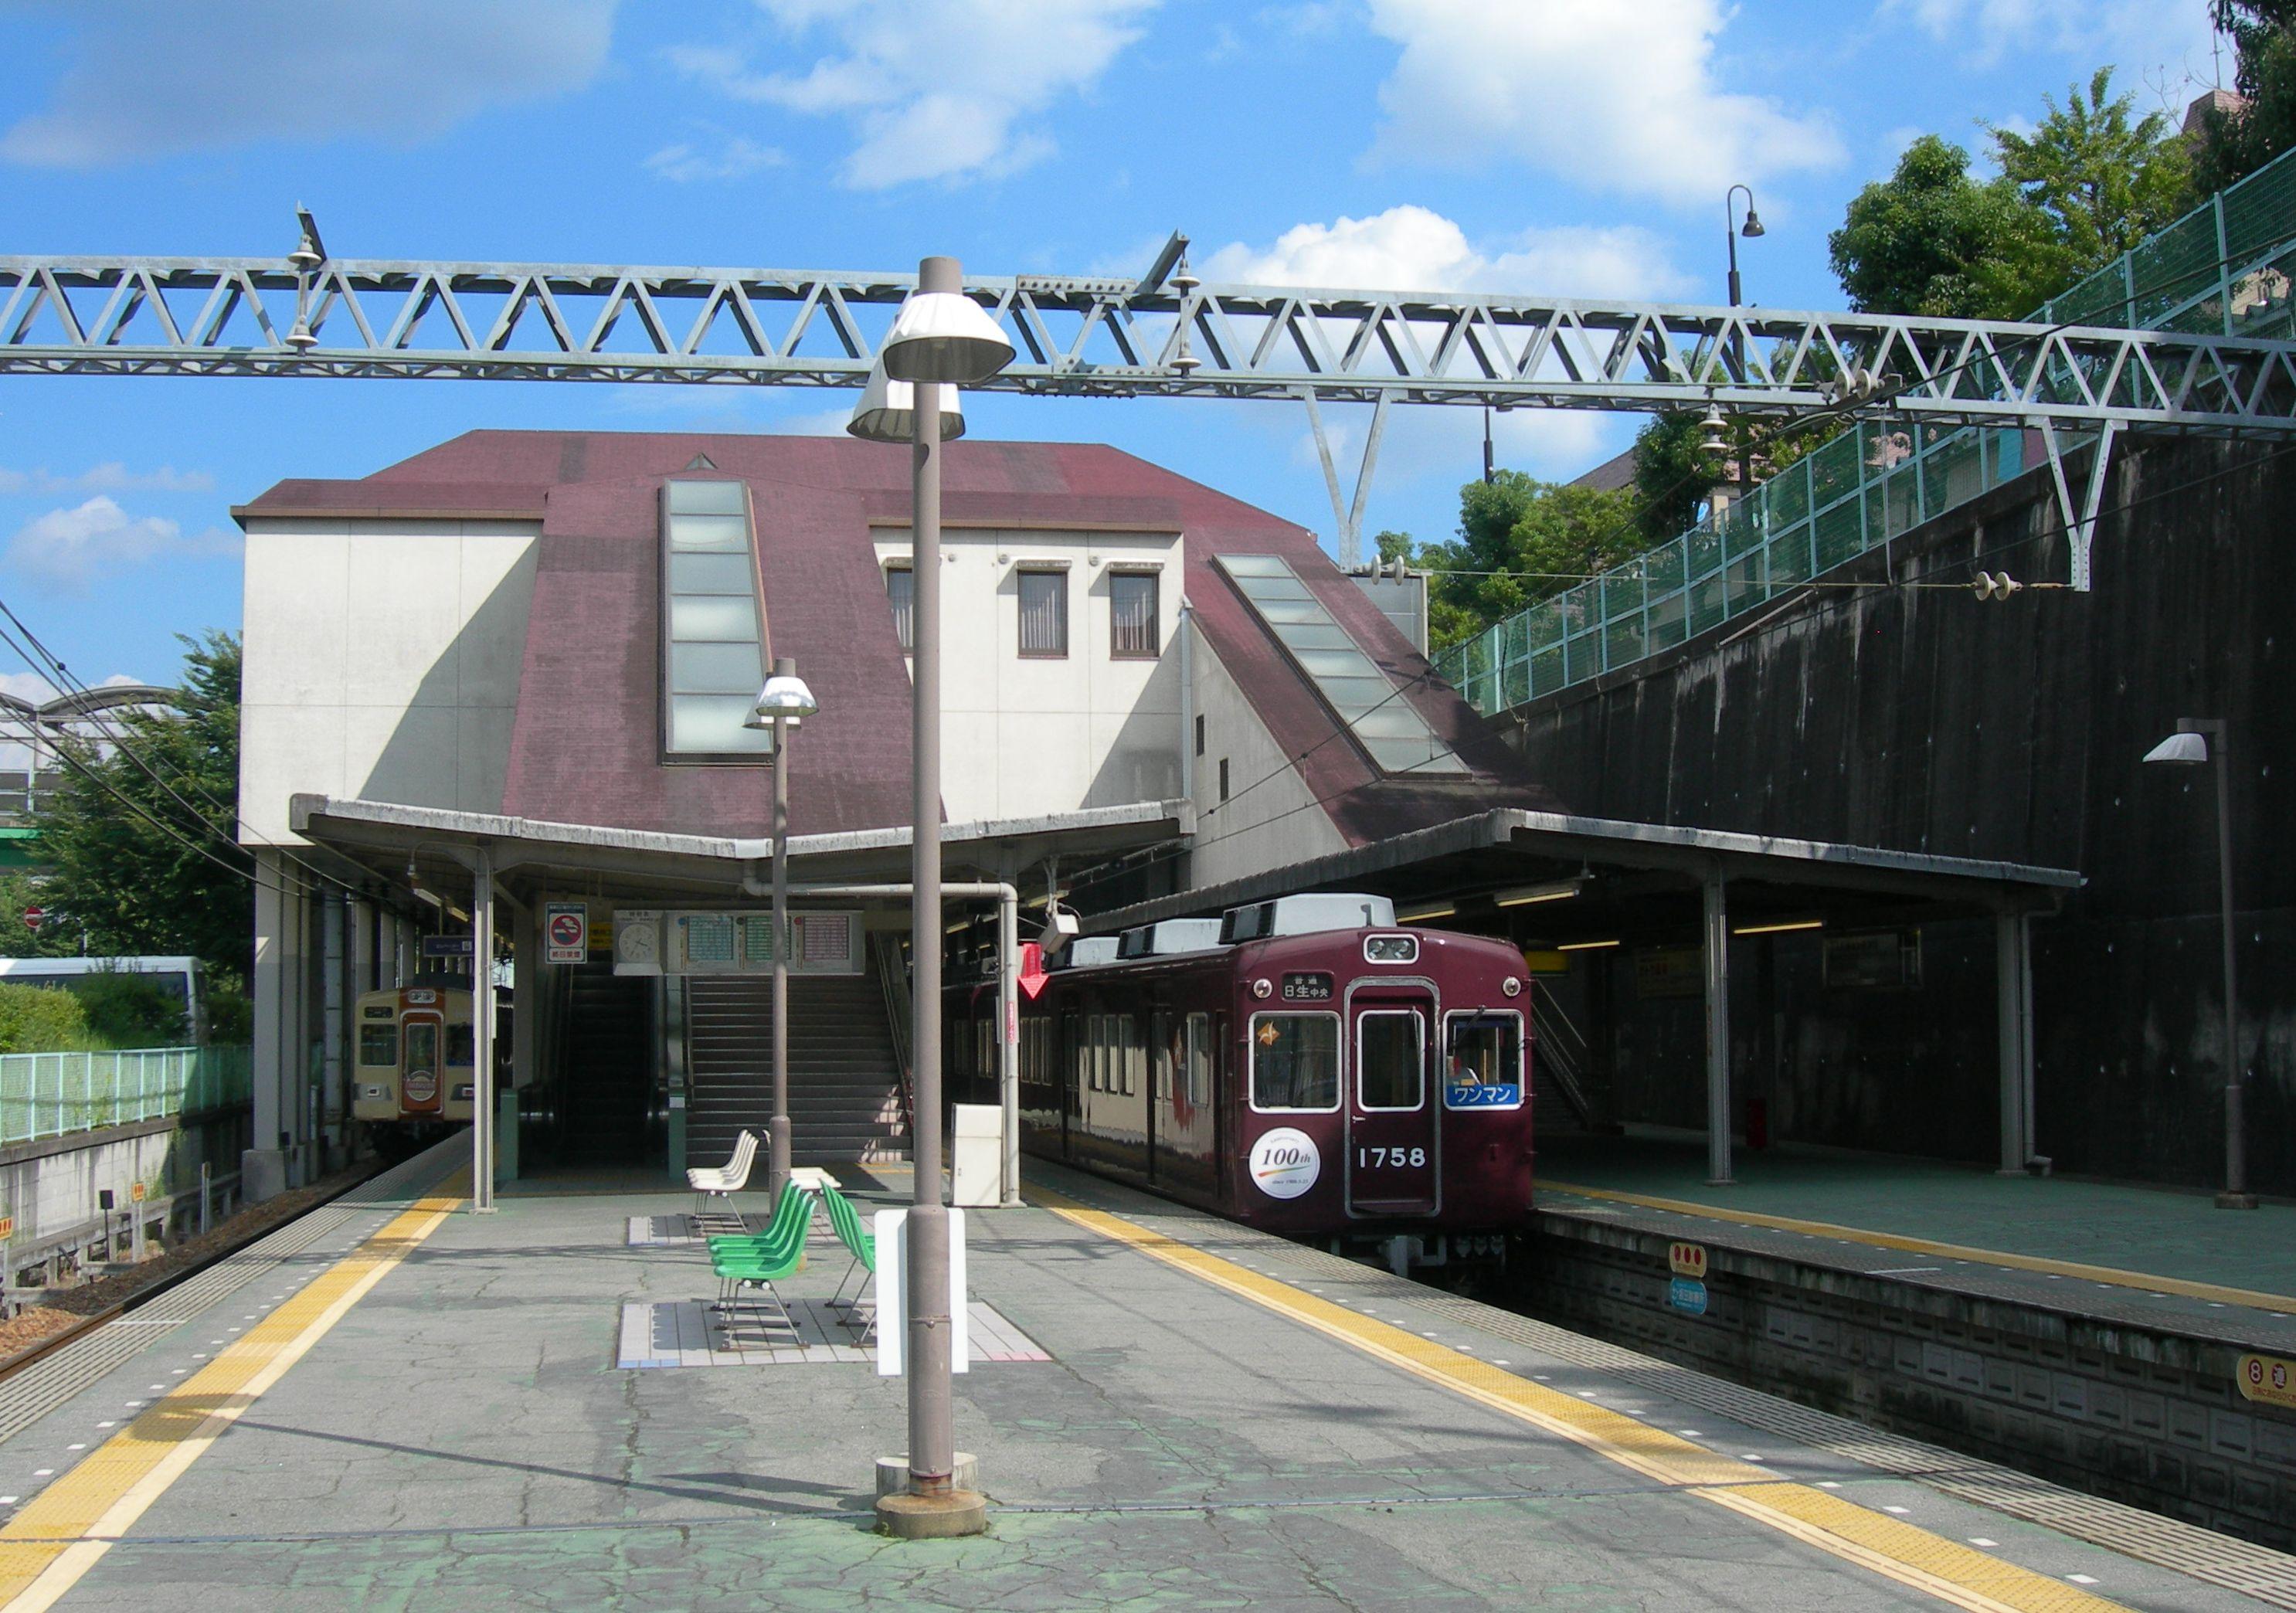 https://upload.wikimedia.org/wikipedia/commons/0/0a/Nissei-chuo_station_platform.jpg